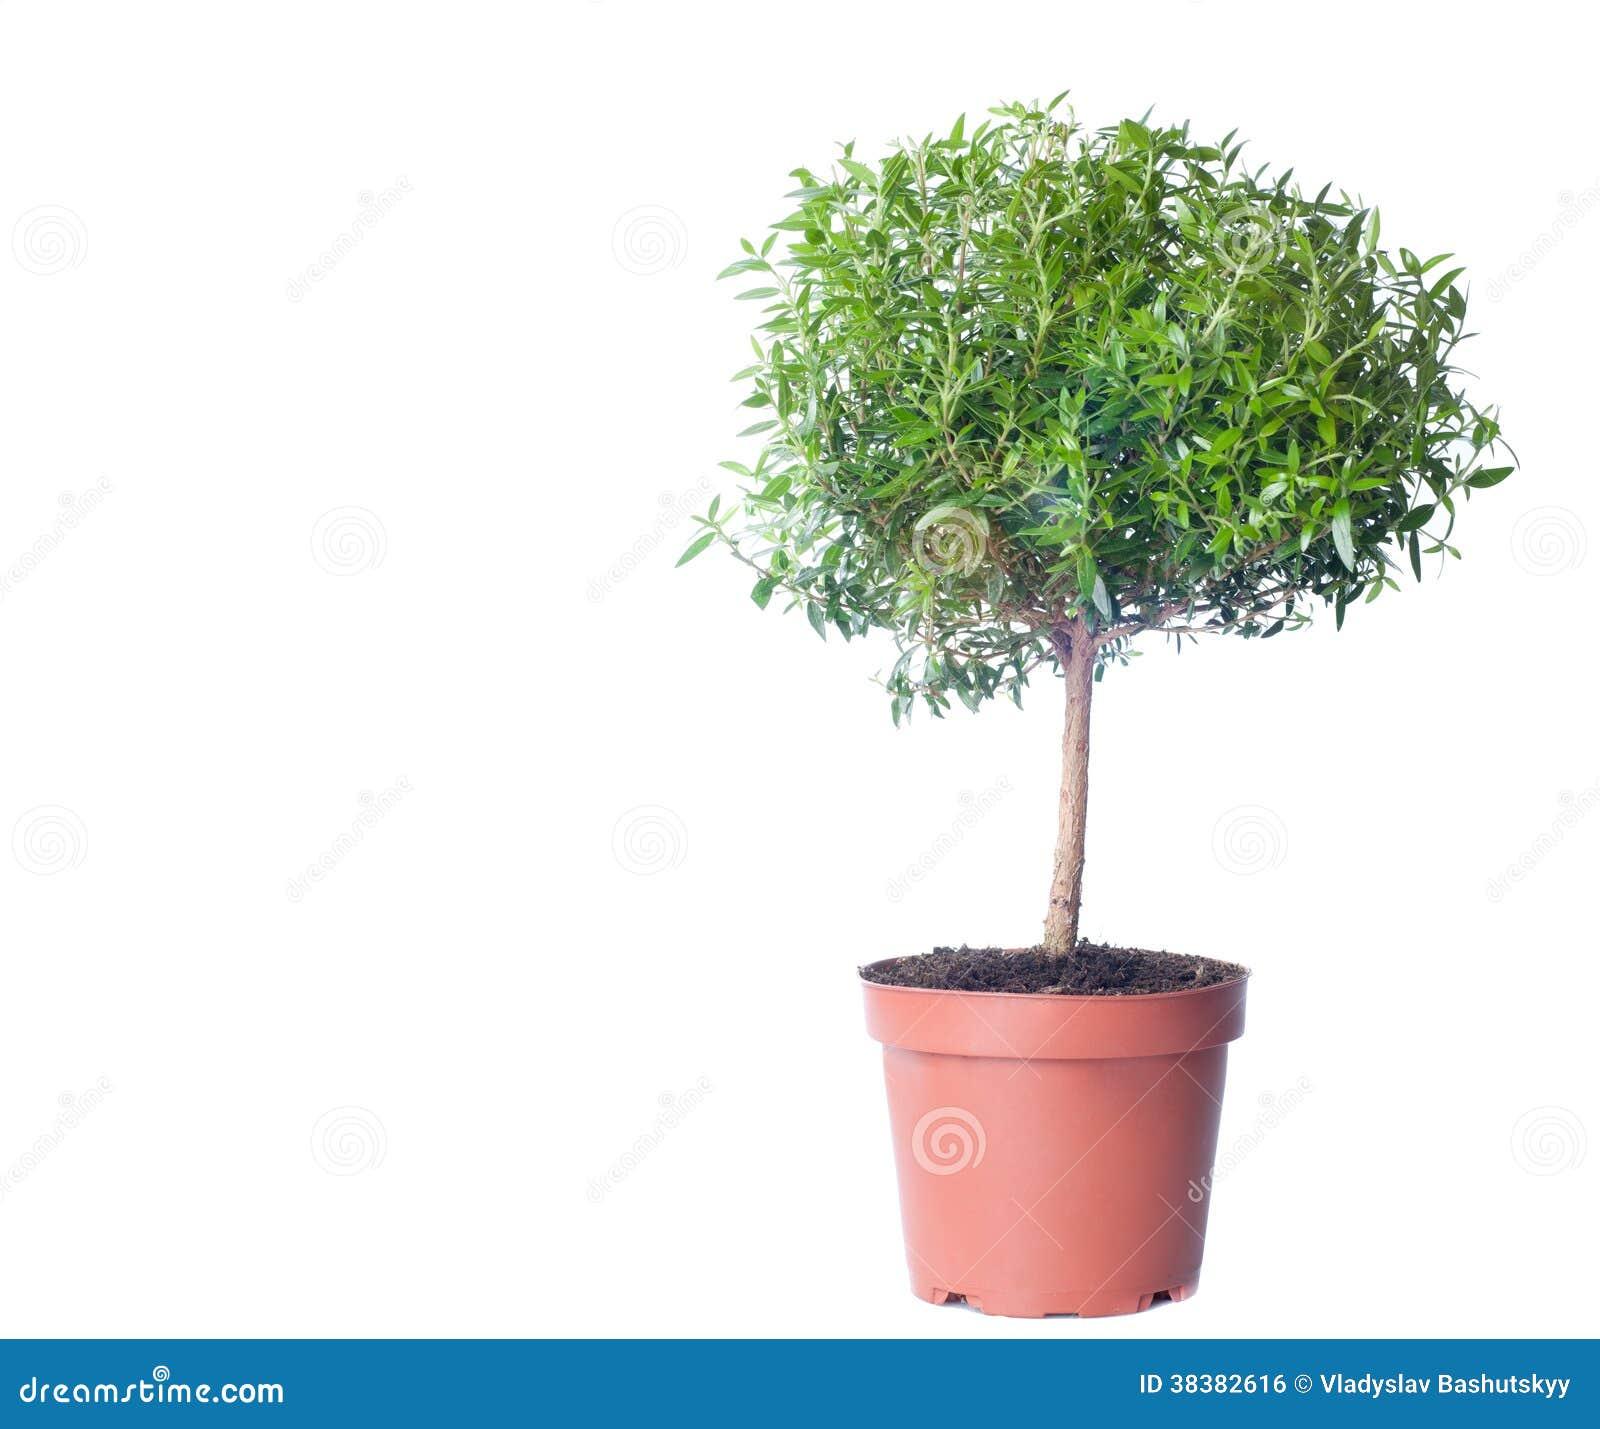 Small tree growing on white background stock photo image of large small tree growing on white background mightylinksfo